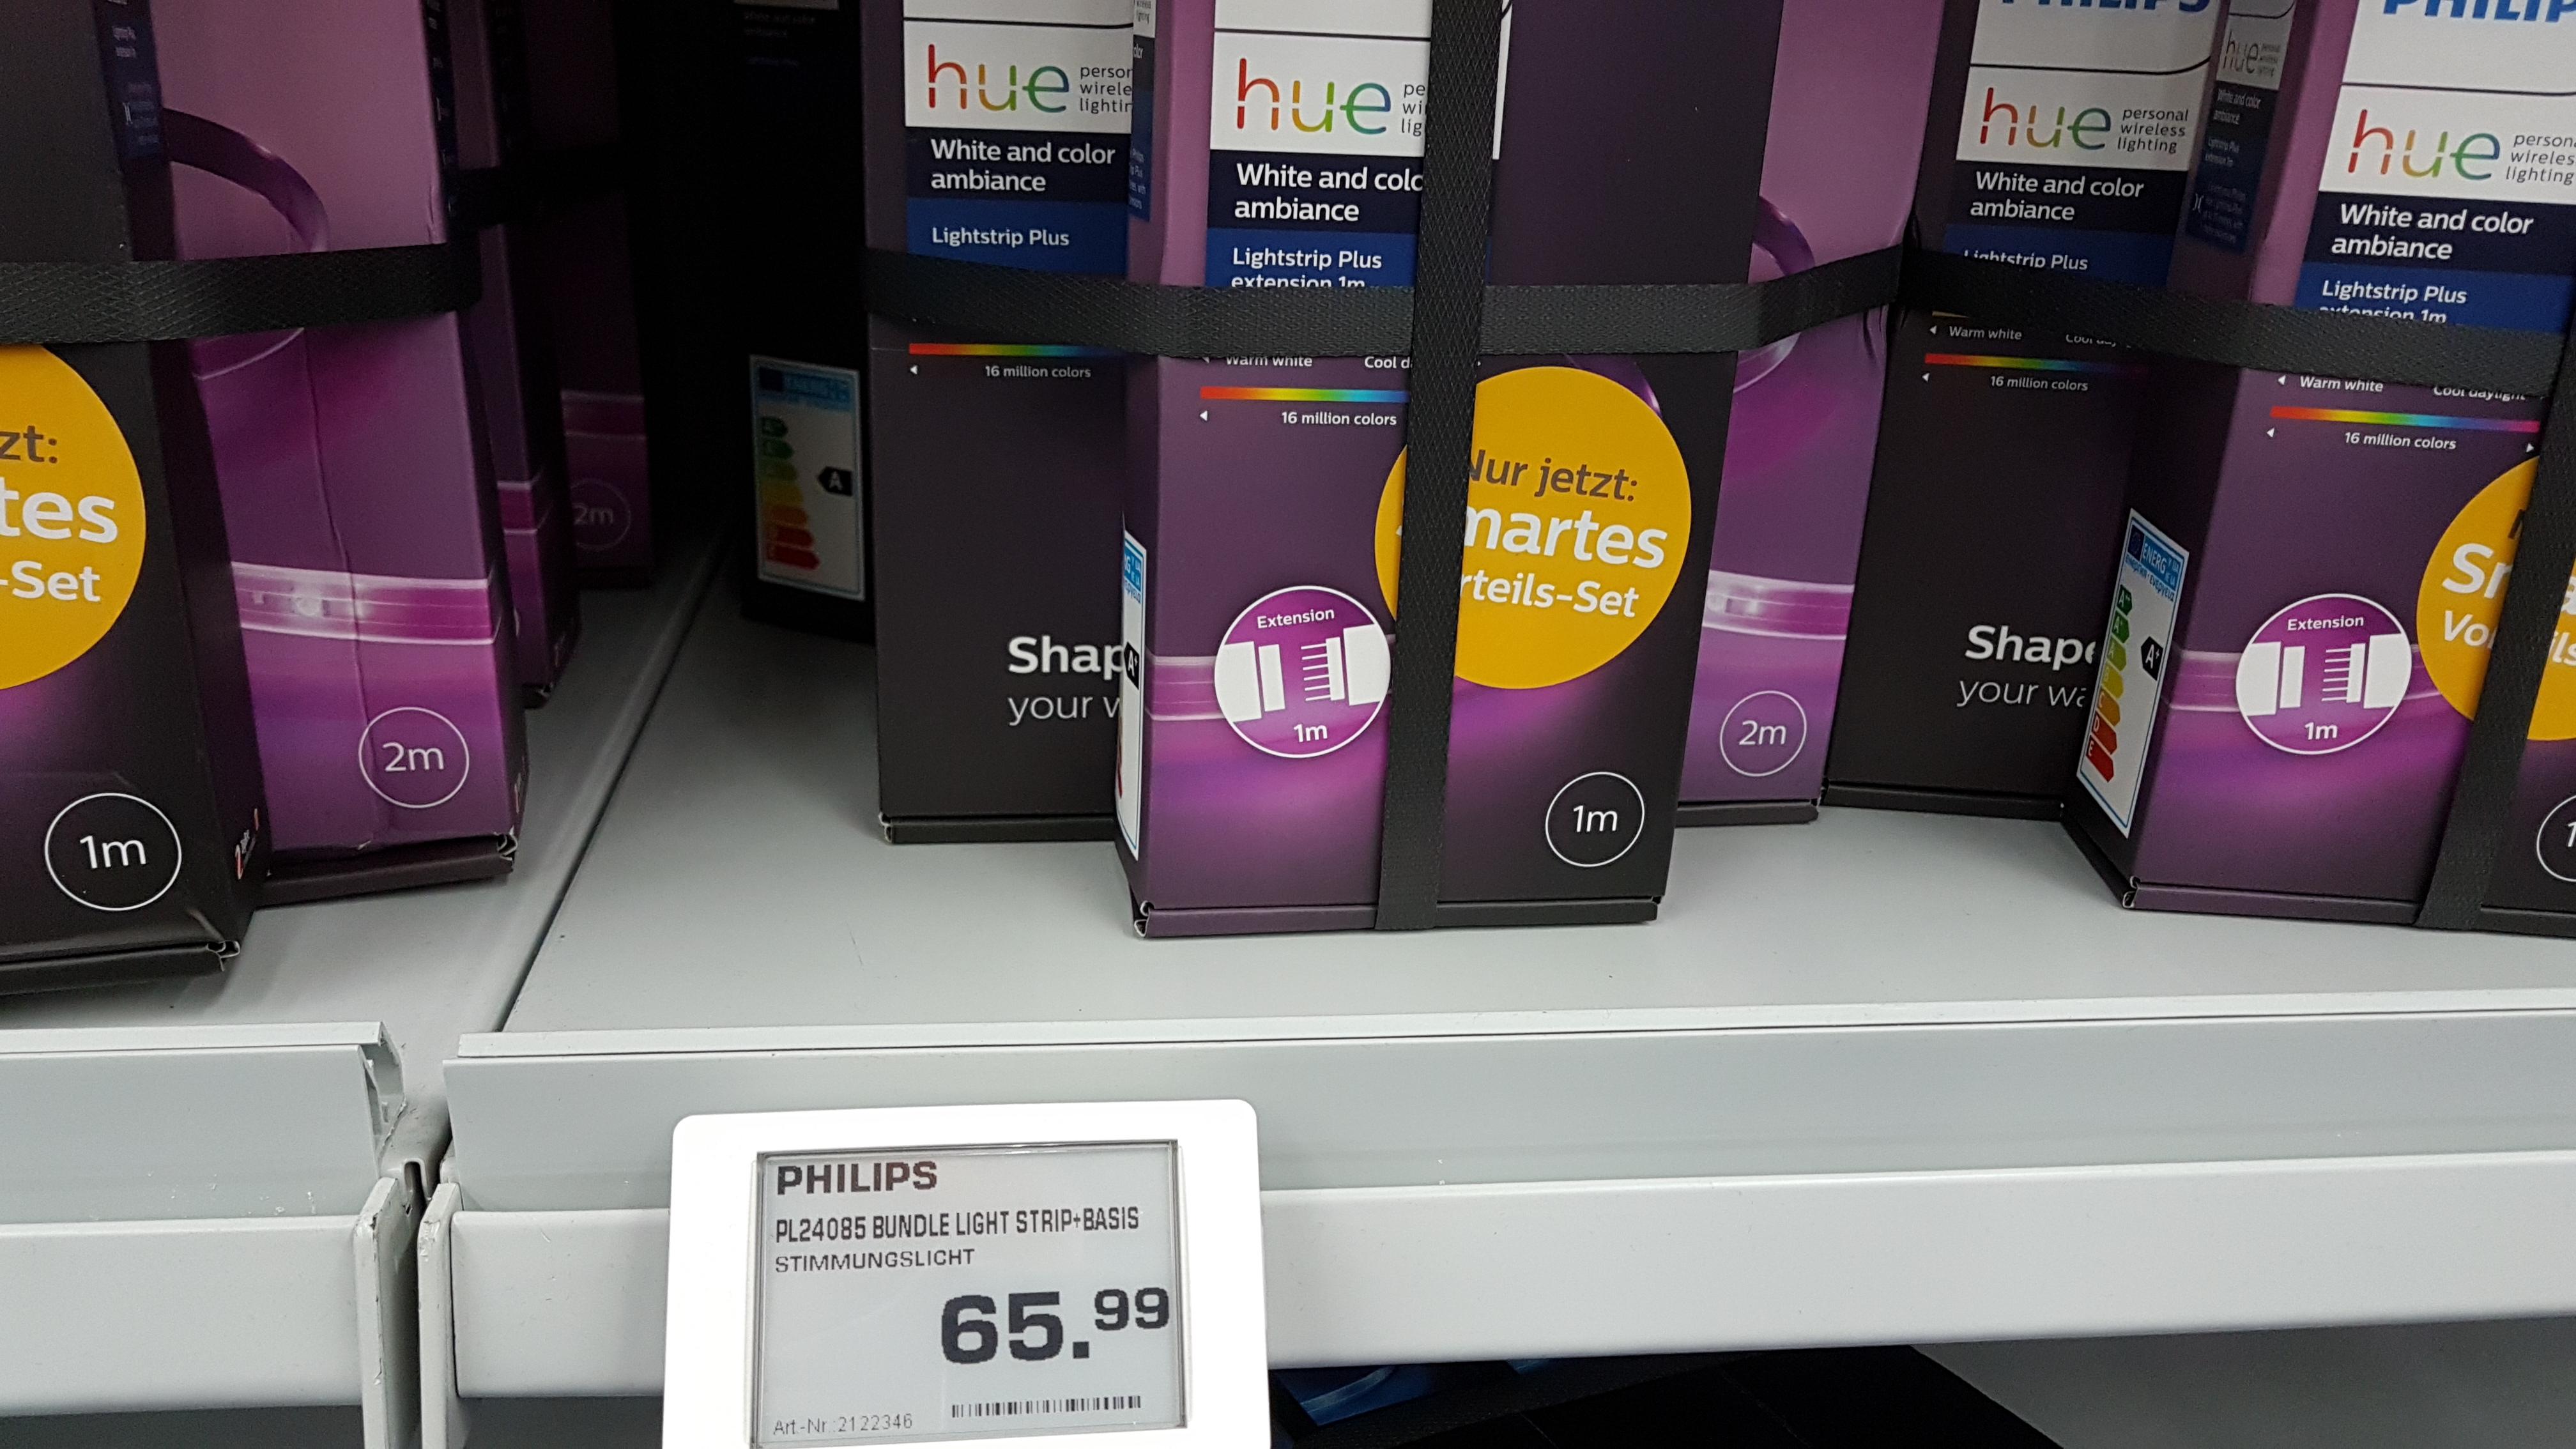 Saturn (Lokal?) - Philips Hue LightStrip Plus 2m Basis + 1m Erweiterung